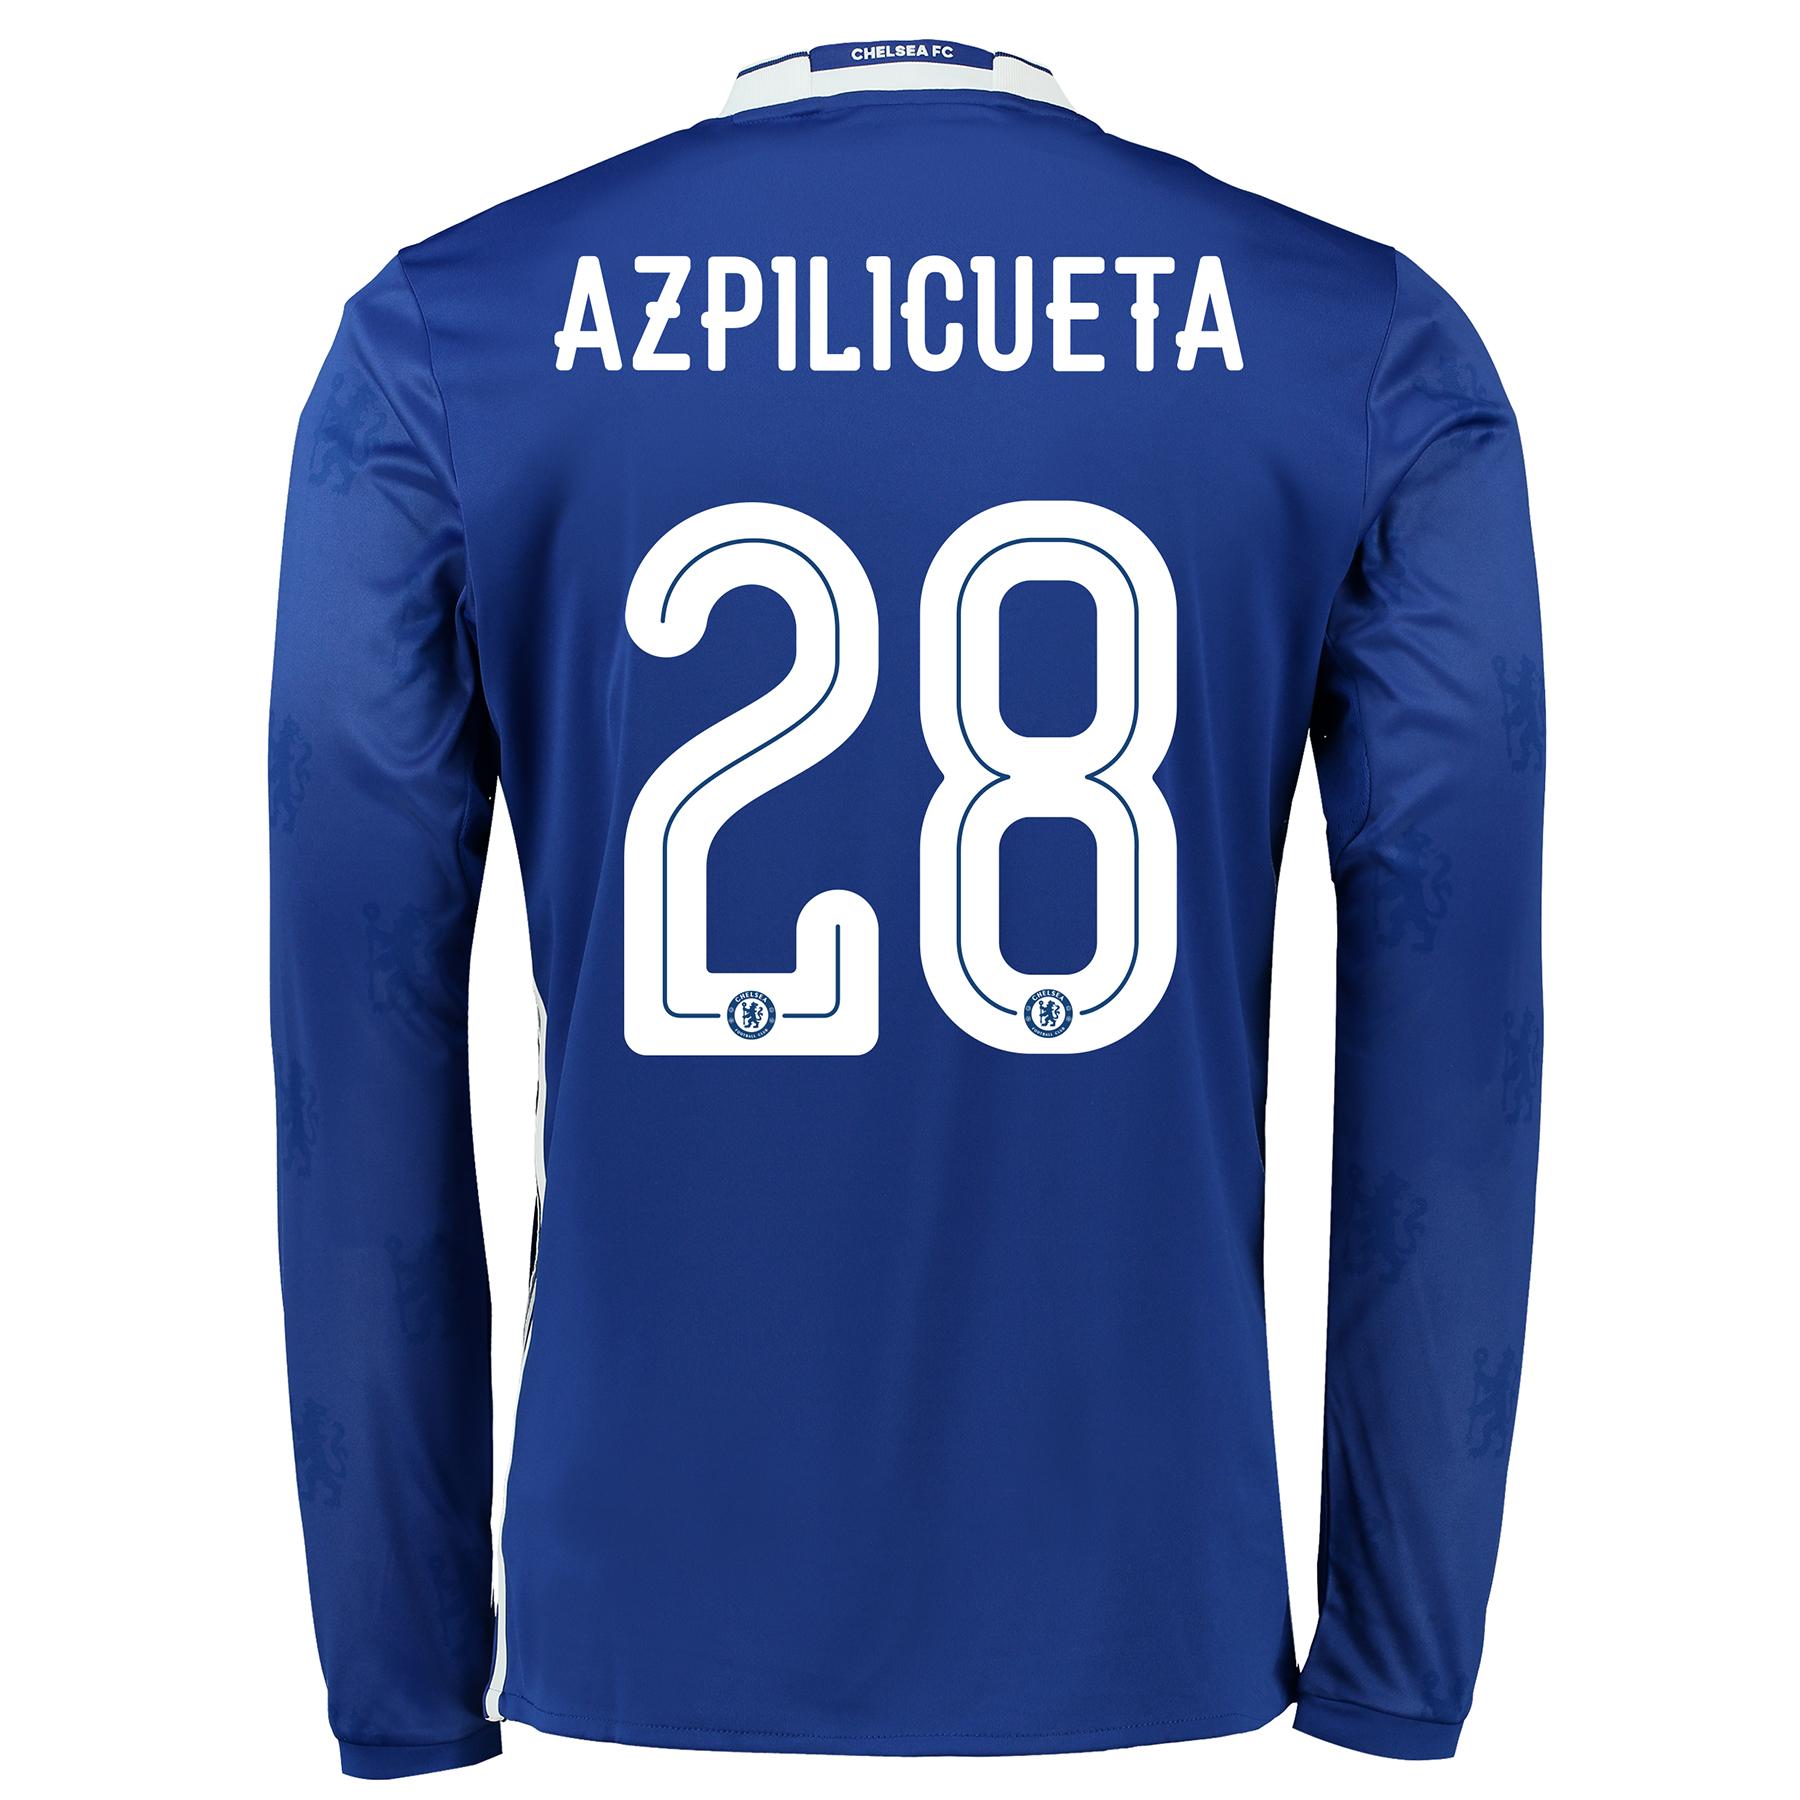 Chelsea Linear Home Shirt 2016-17 - Kids - Long Sleeve with Azpilicuet